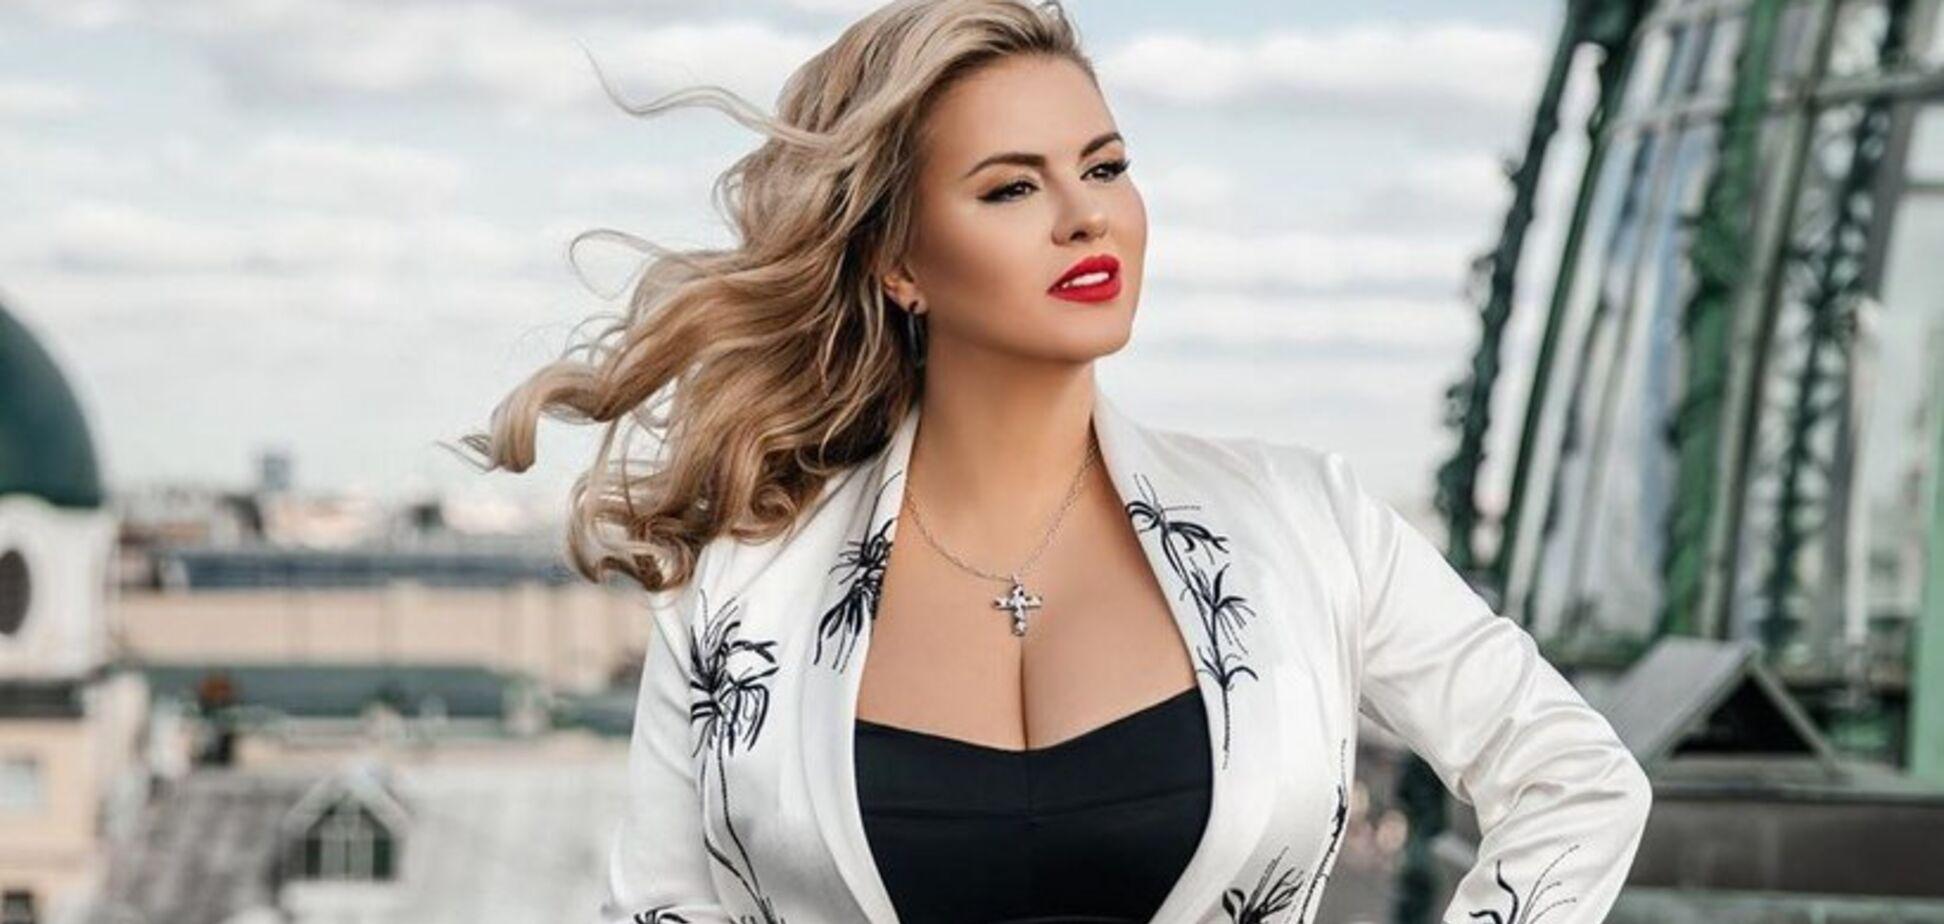 Популярна російська співачка зменшила груди: фото